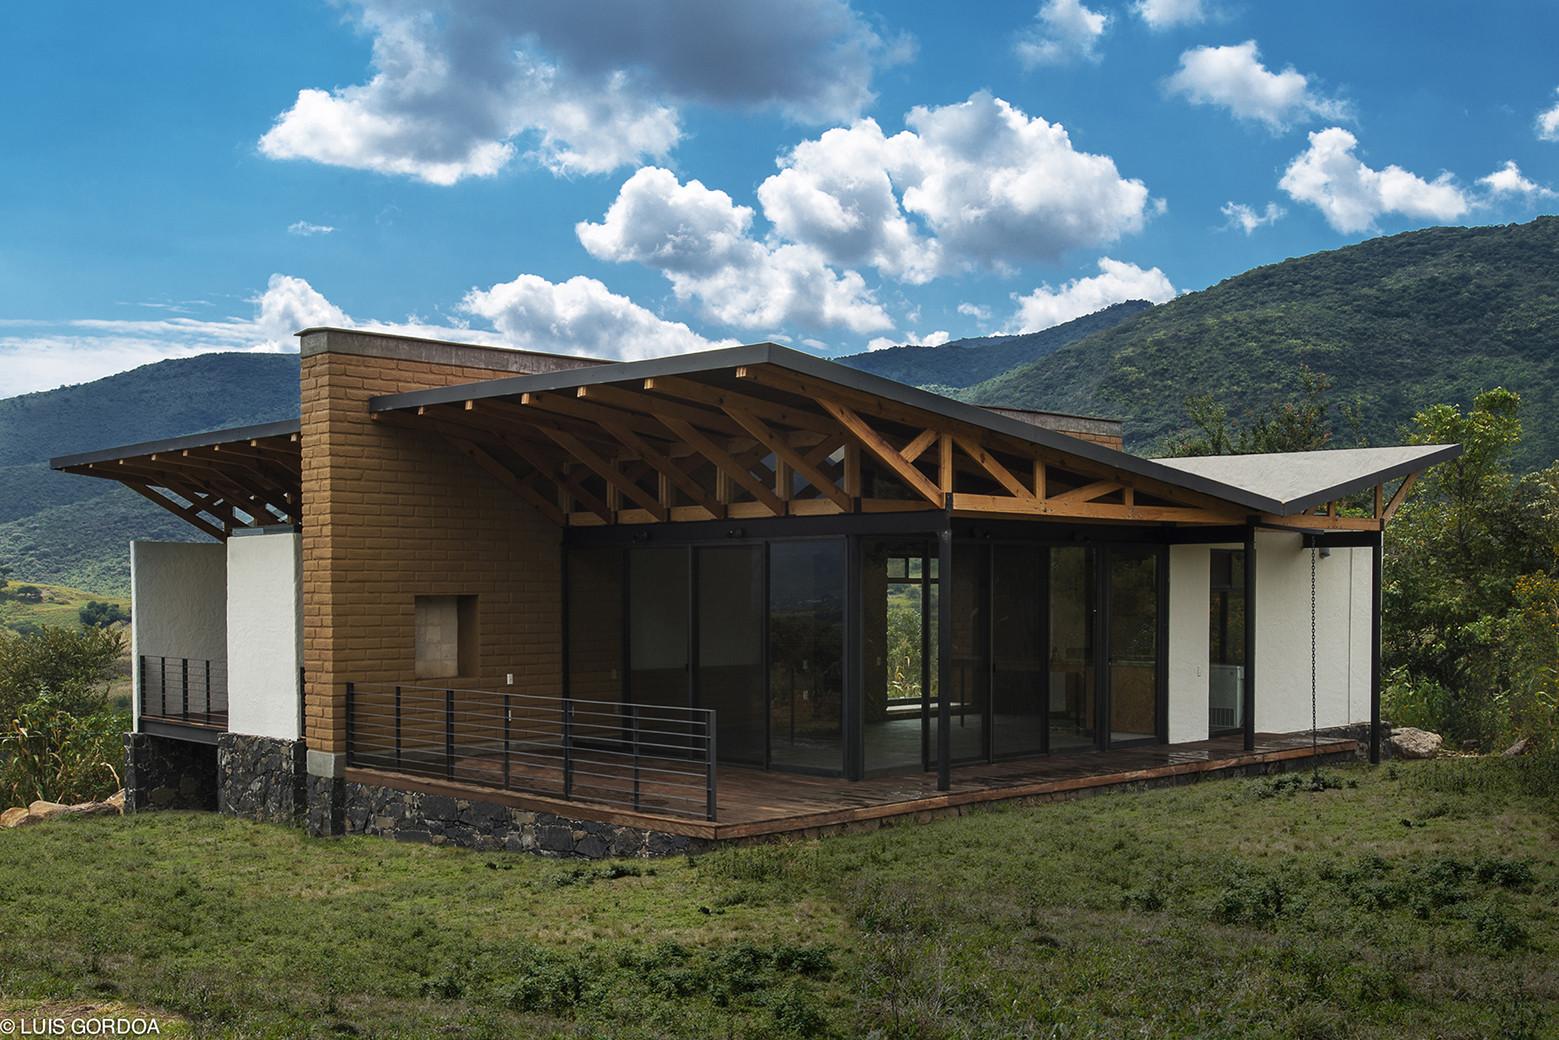 Galer a de casa malinalco arquitectura alternativa 5 for Casa de campo arquitectura